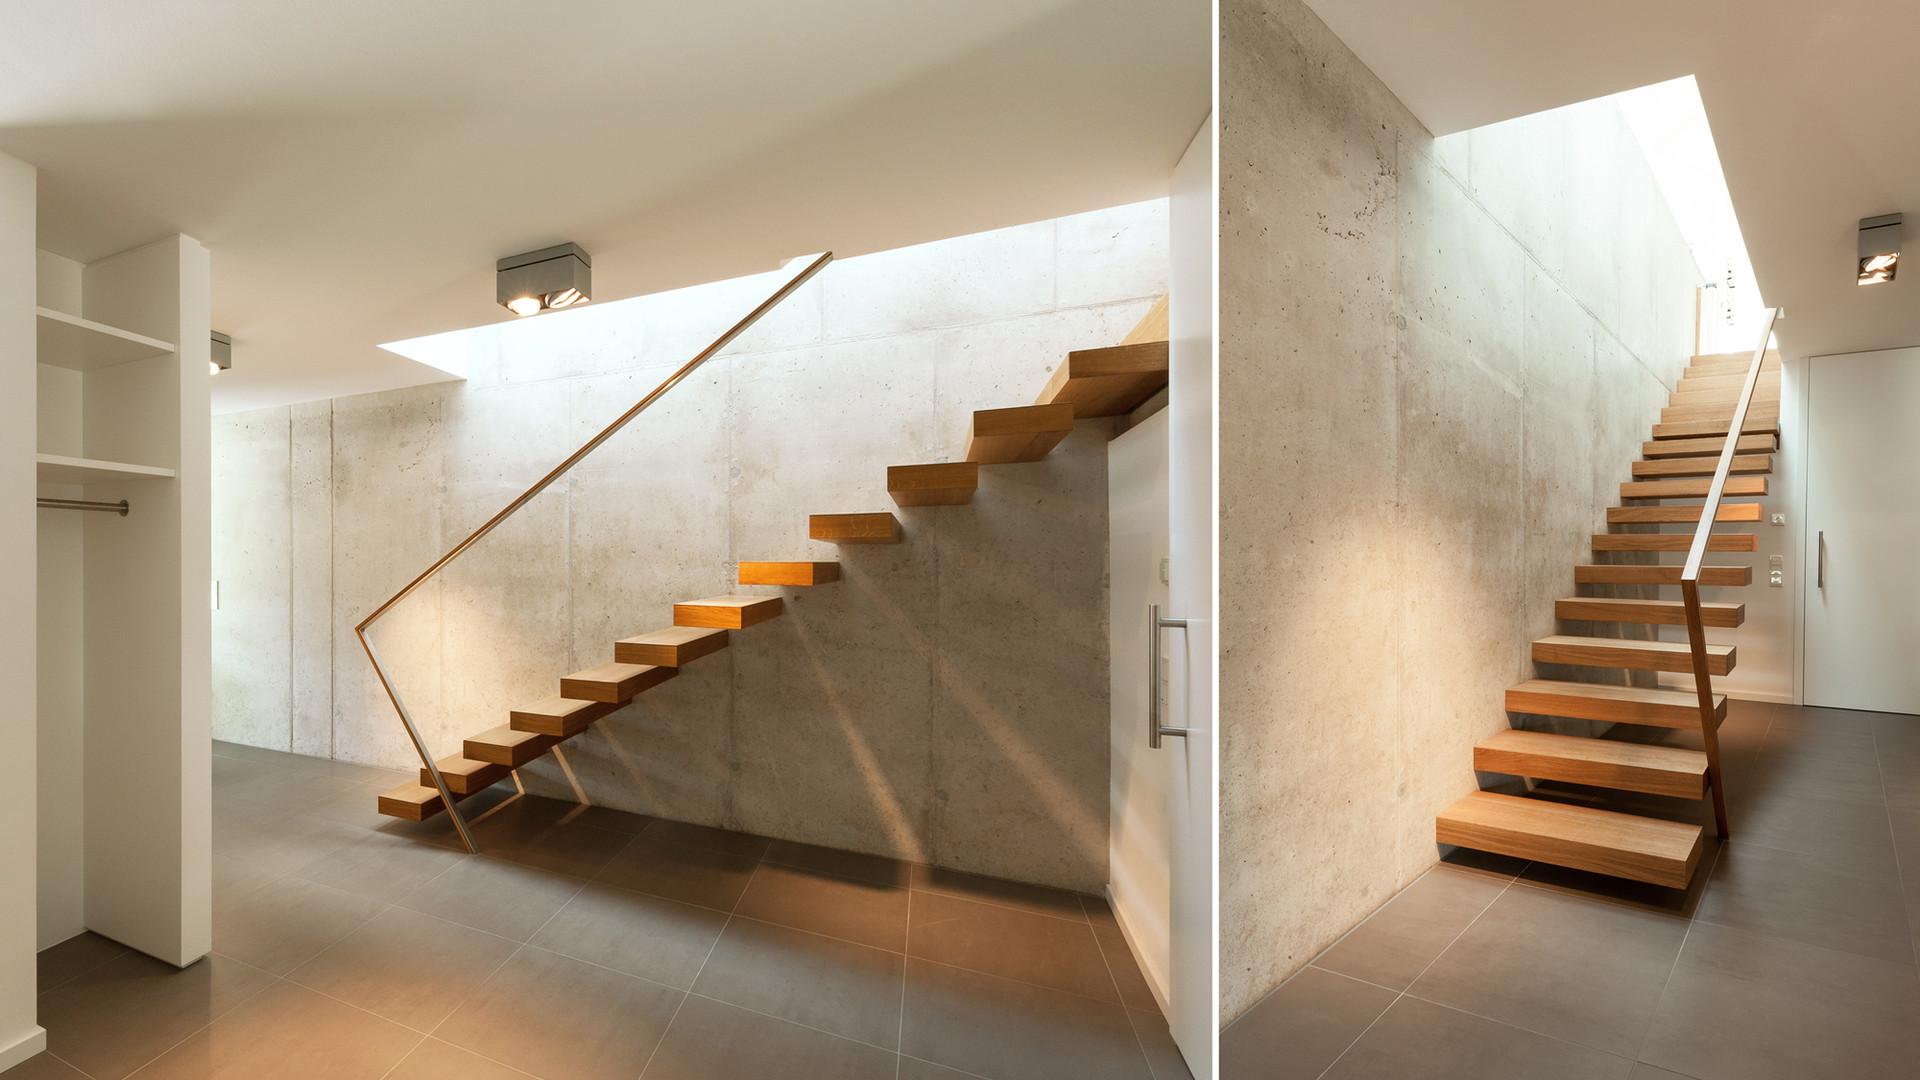 Frei auskragende Treppe an Betonwand